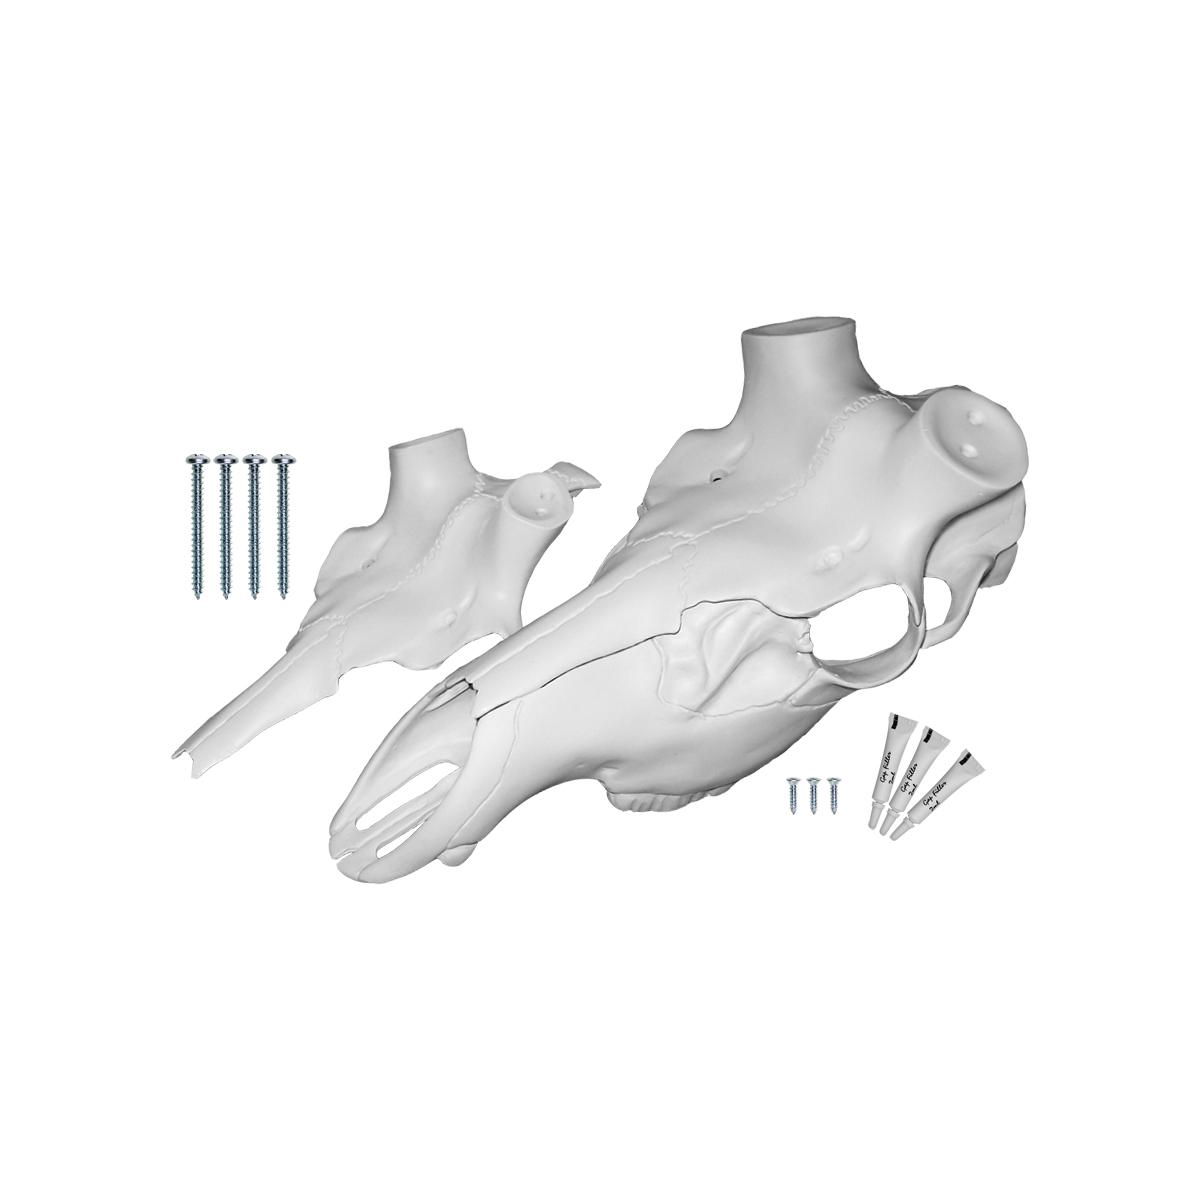 Skull Master Kit European Deer Antler Attachment Mounting Universal Wall Decor